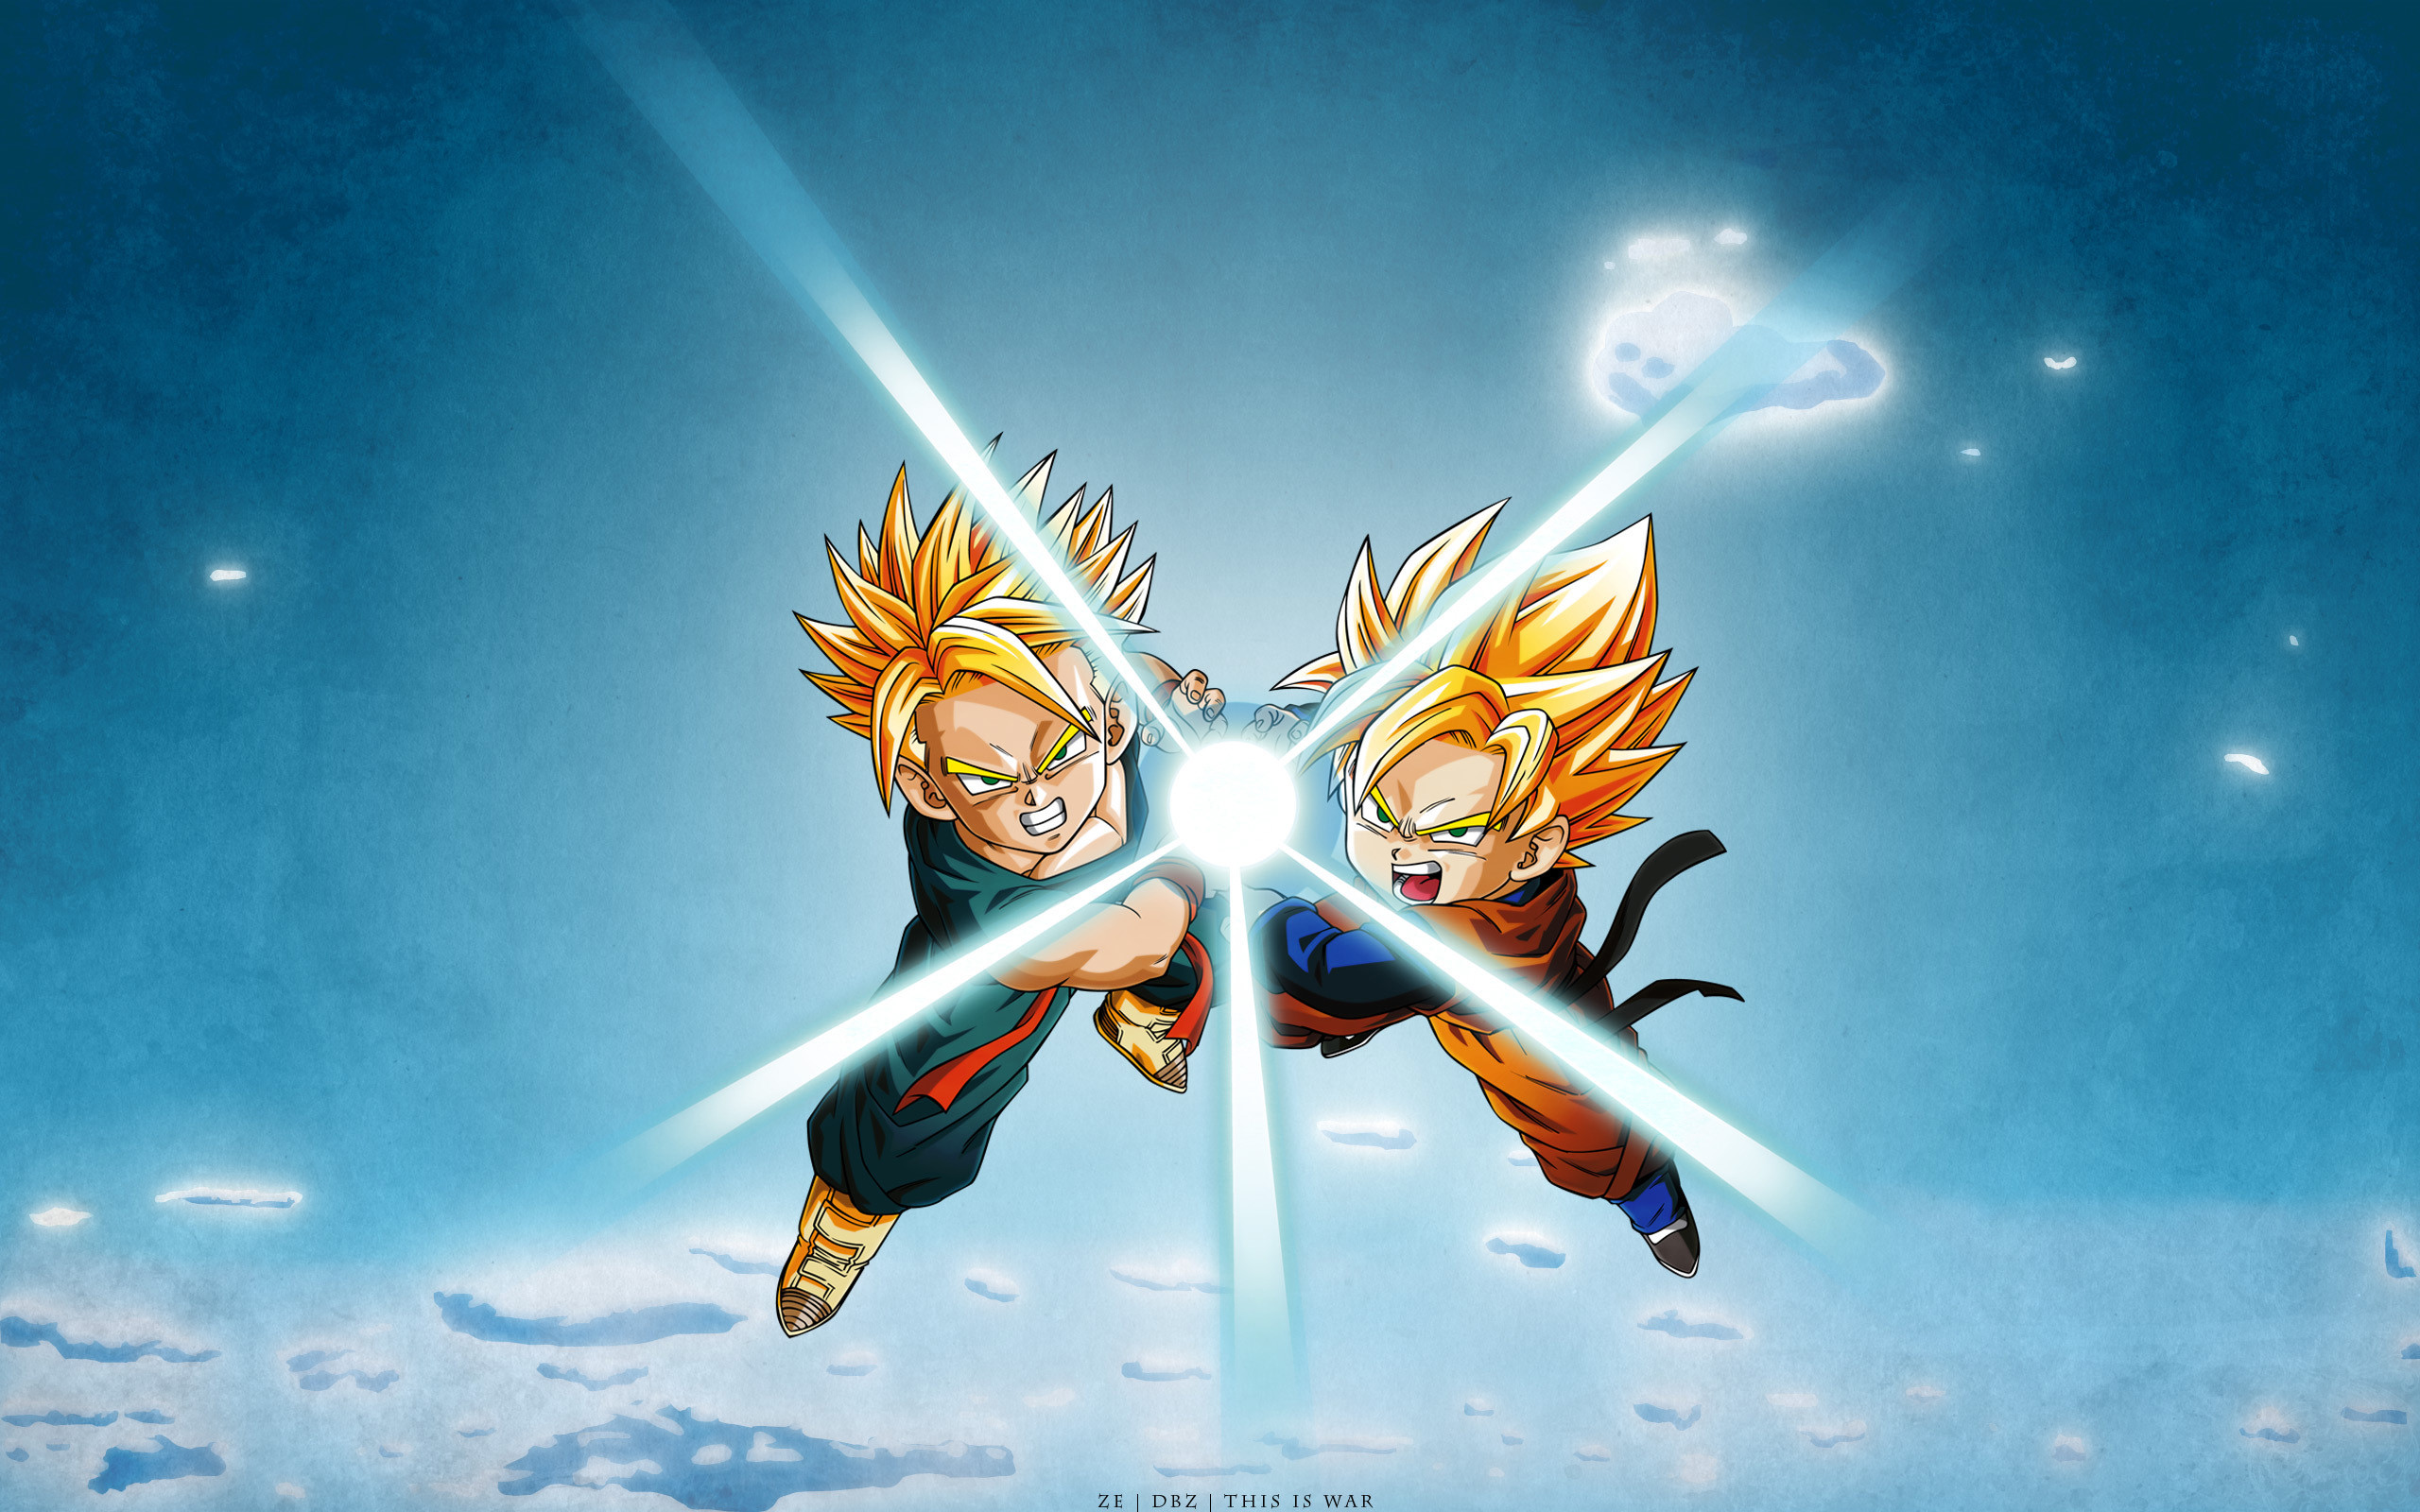 Attachment for Dragon Ball Z Wallpaper 19 of 49 – Goten and Trunks  Kamehameha